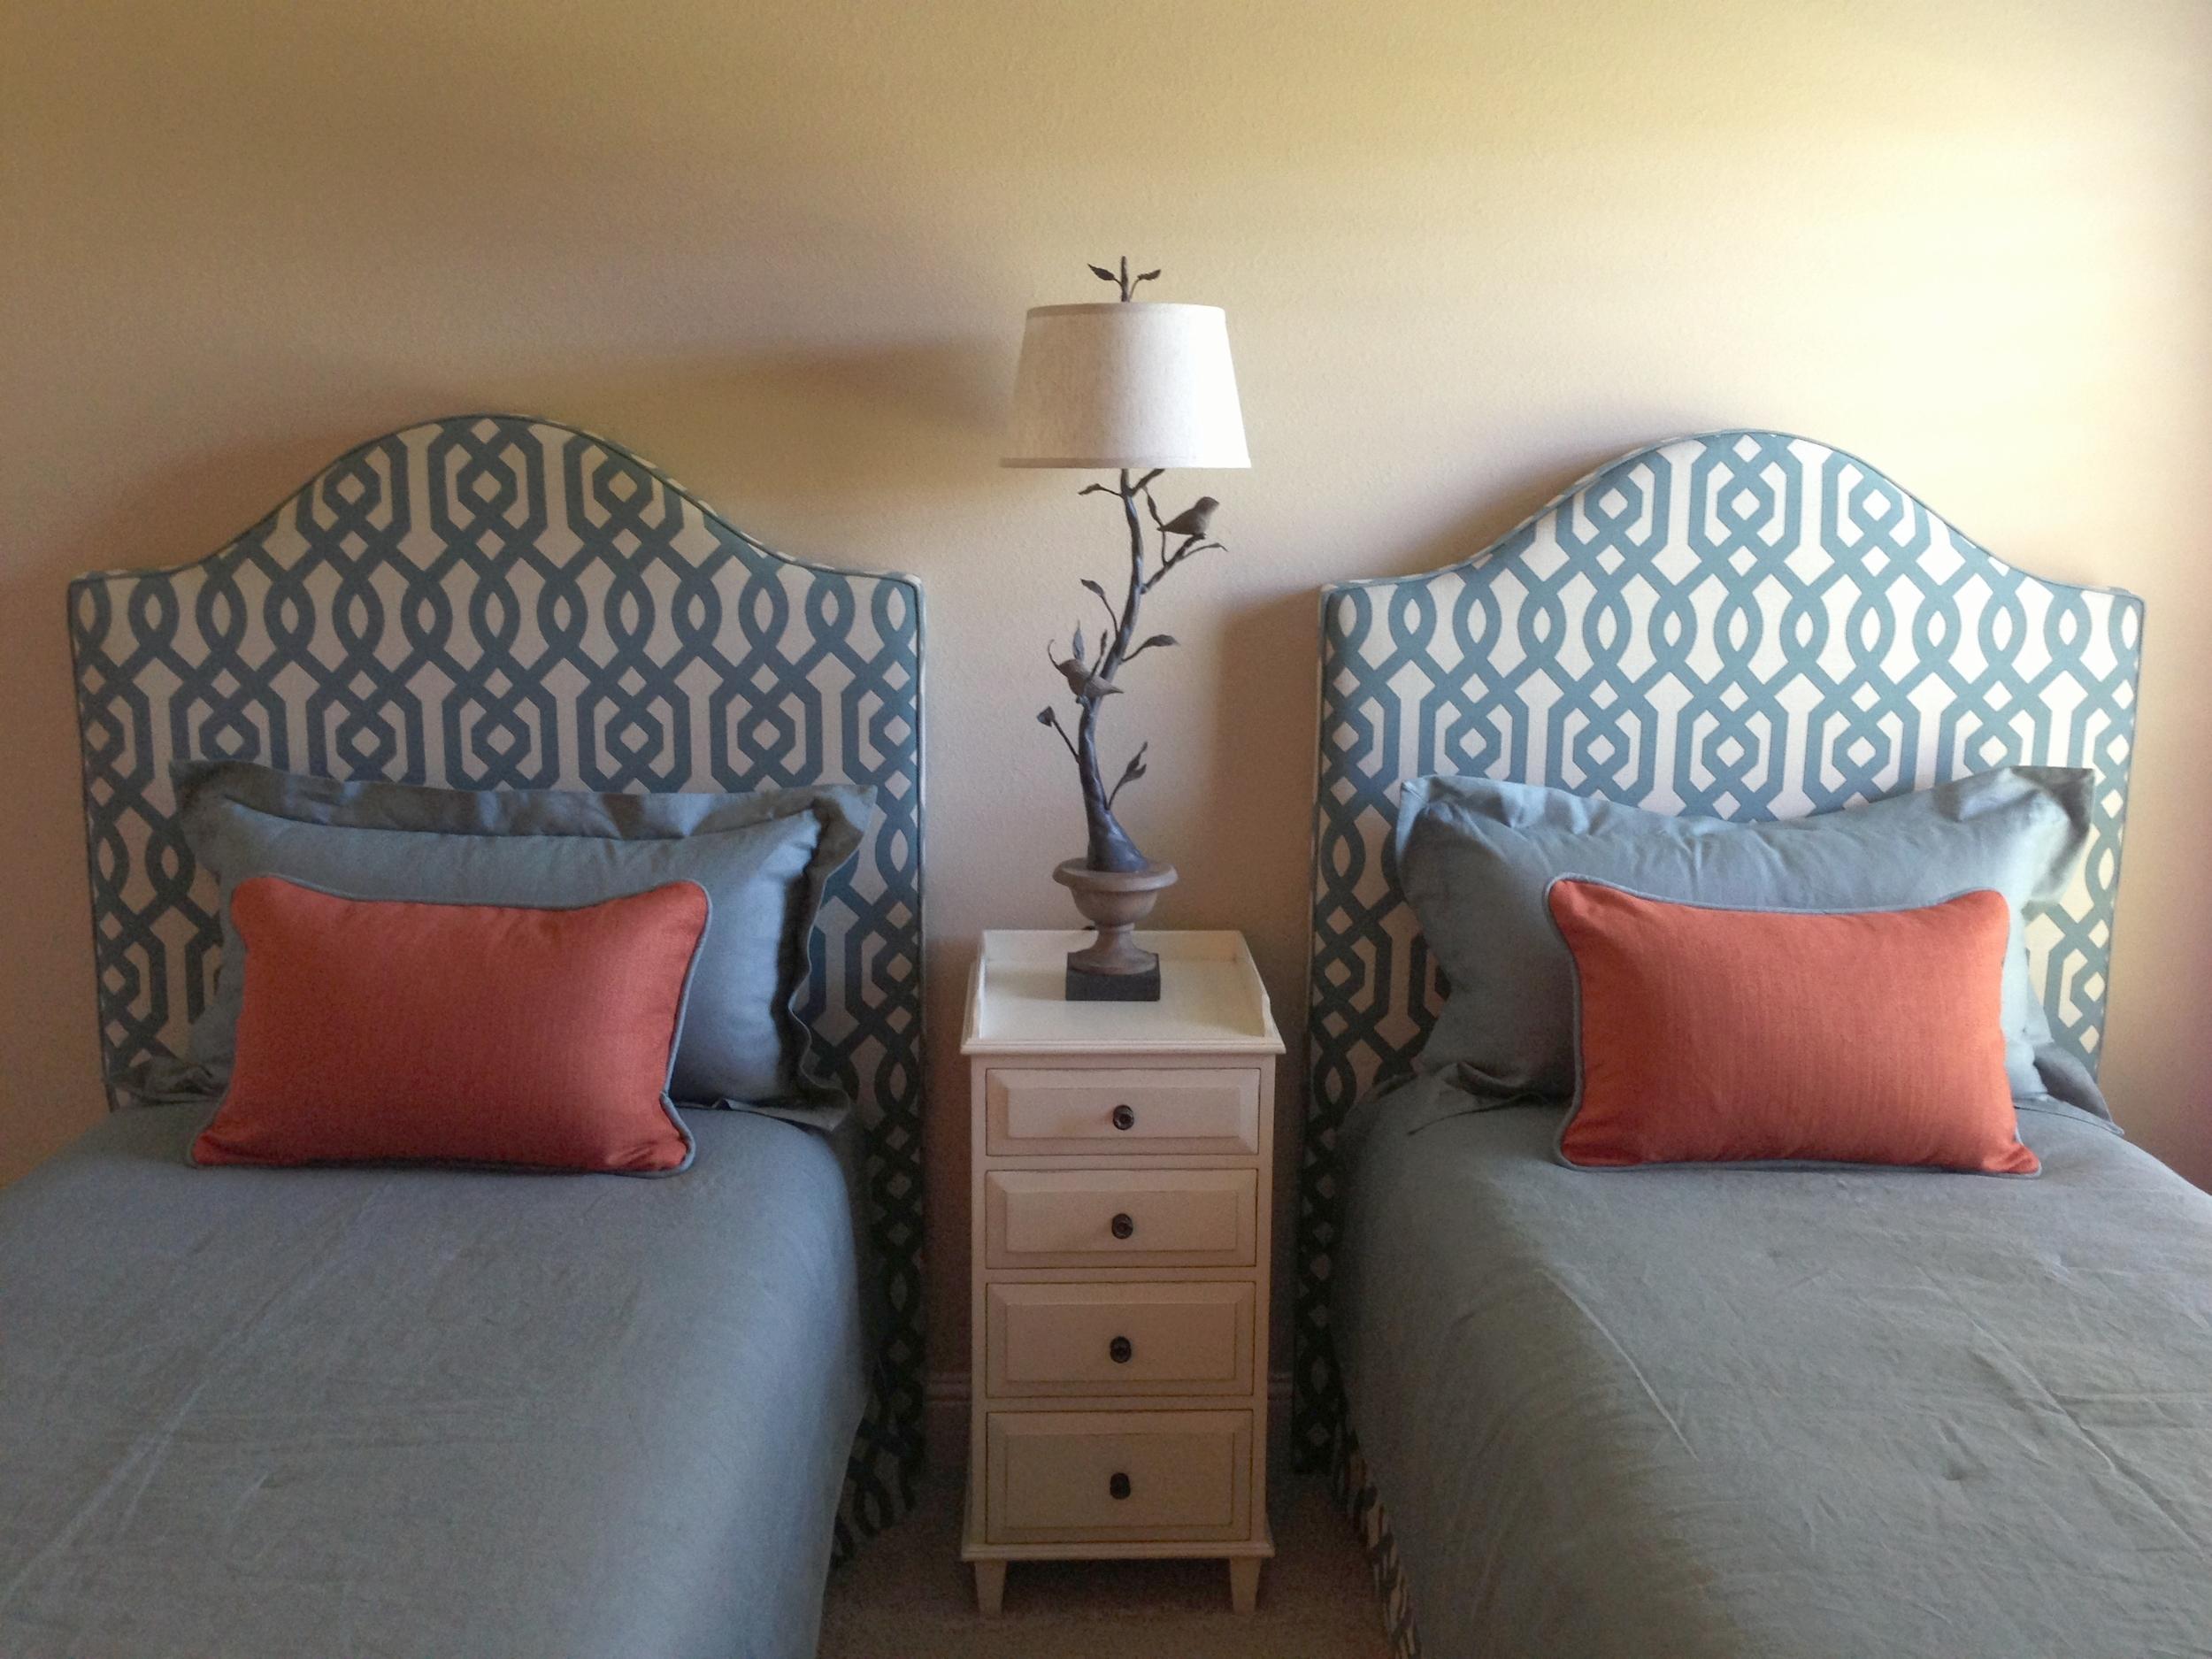 Custom design, bedding, headboard | Designer: Carla Aston